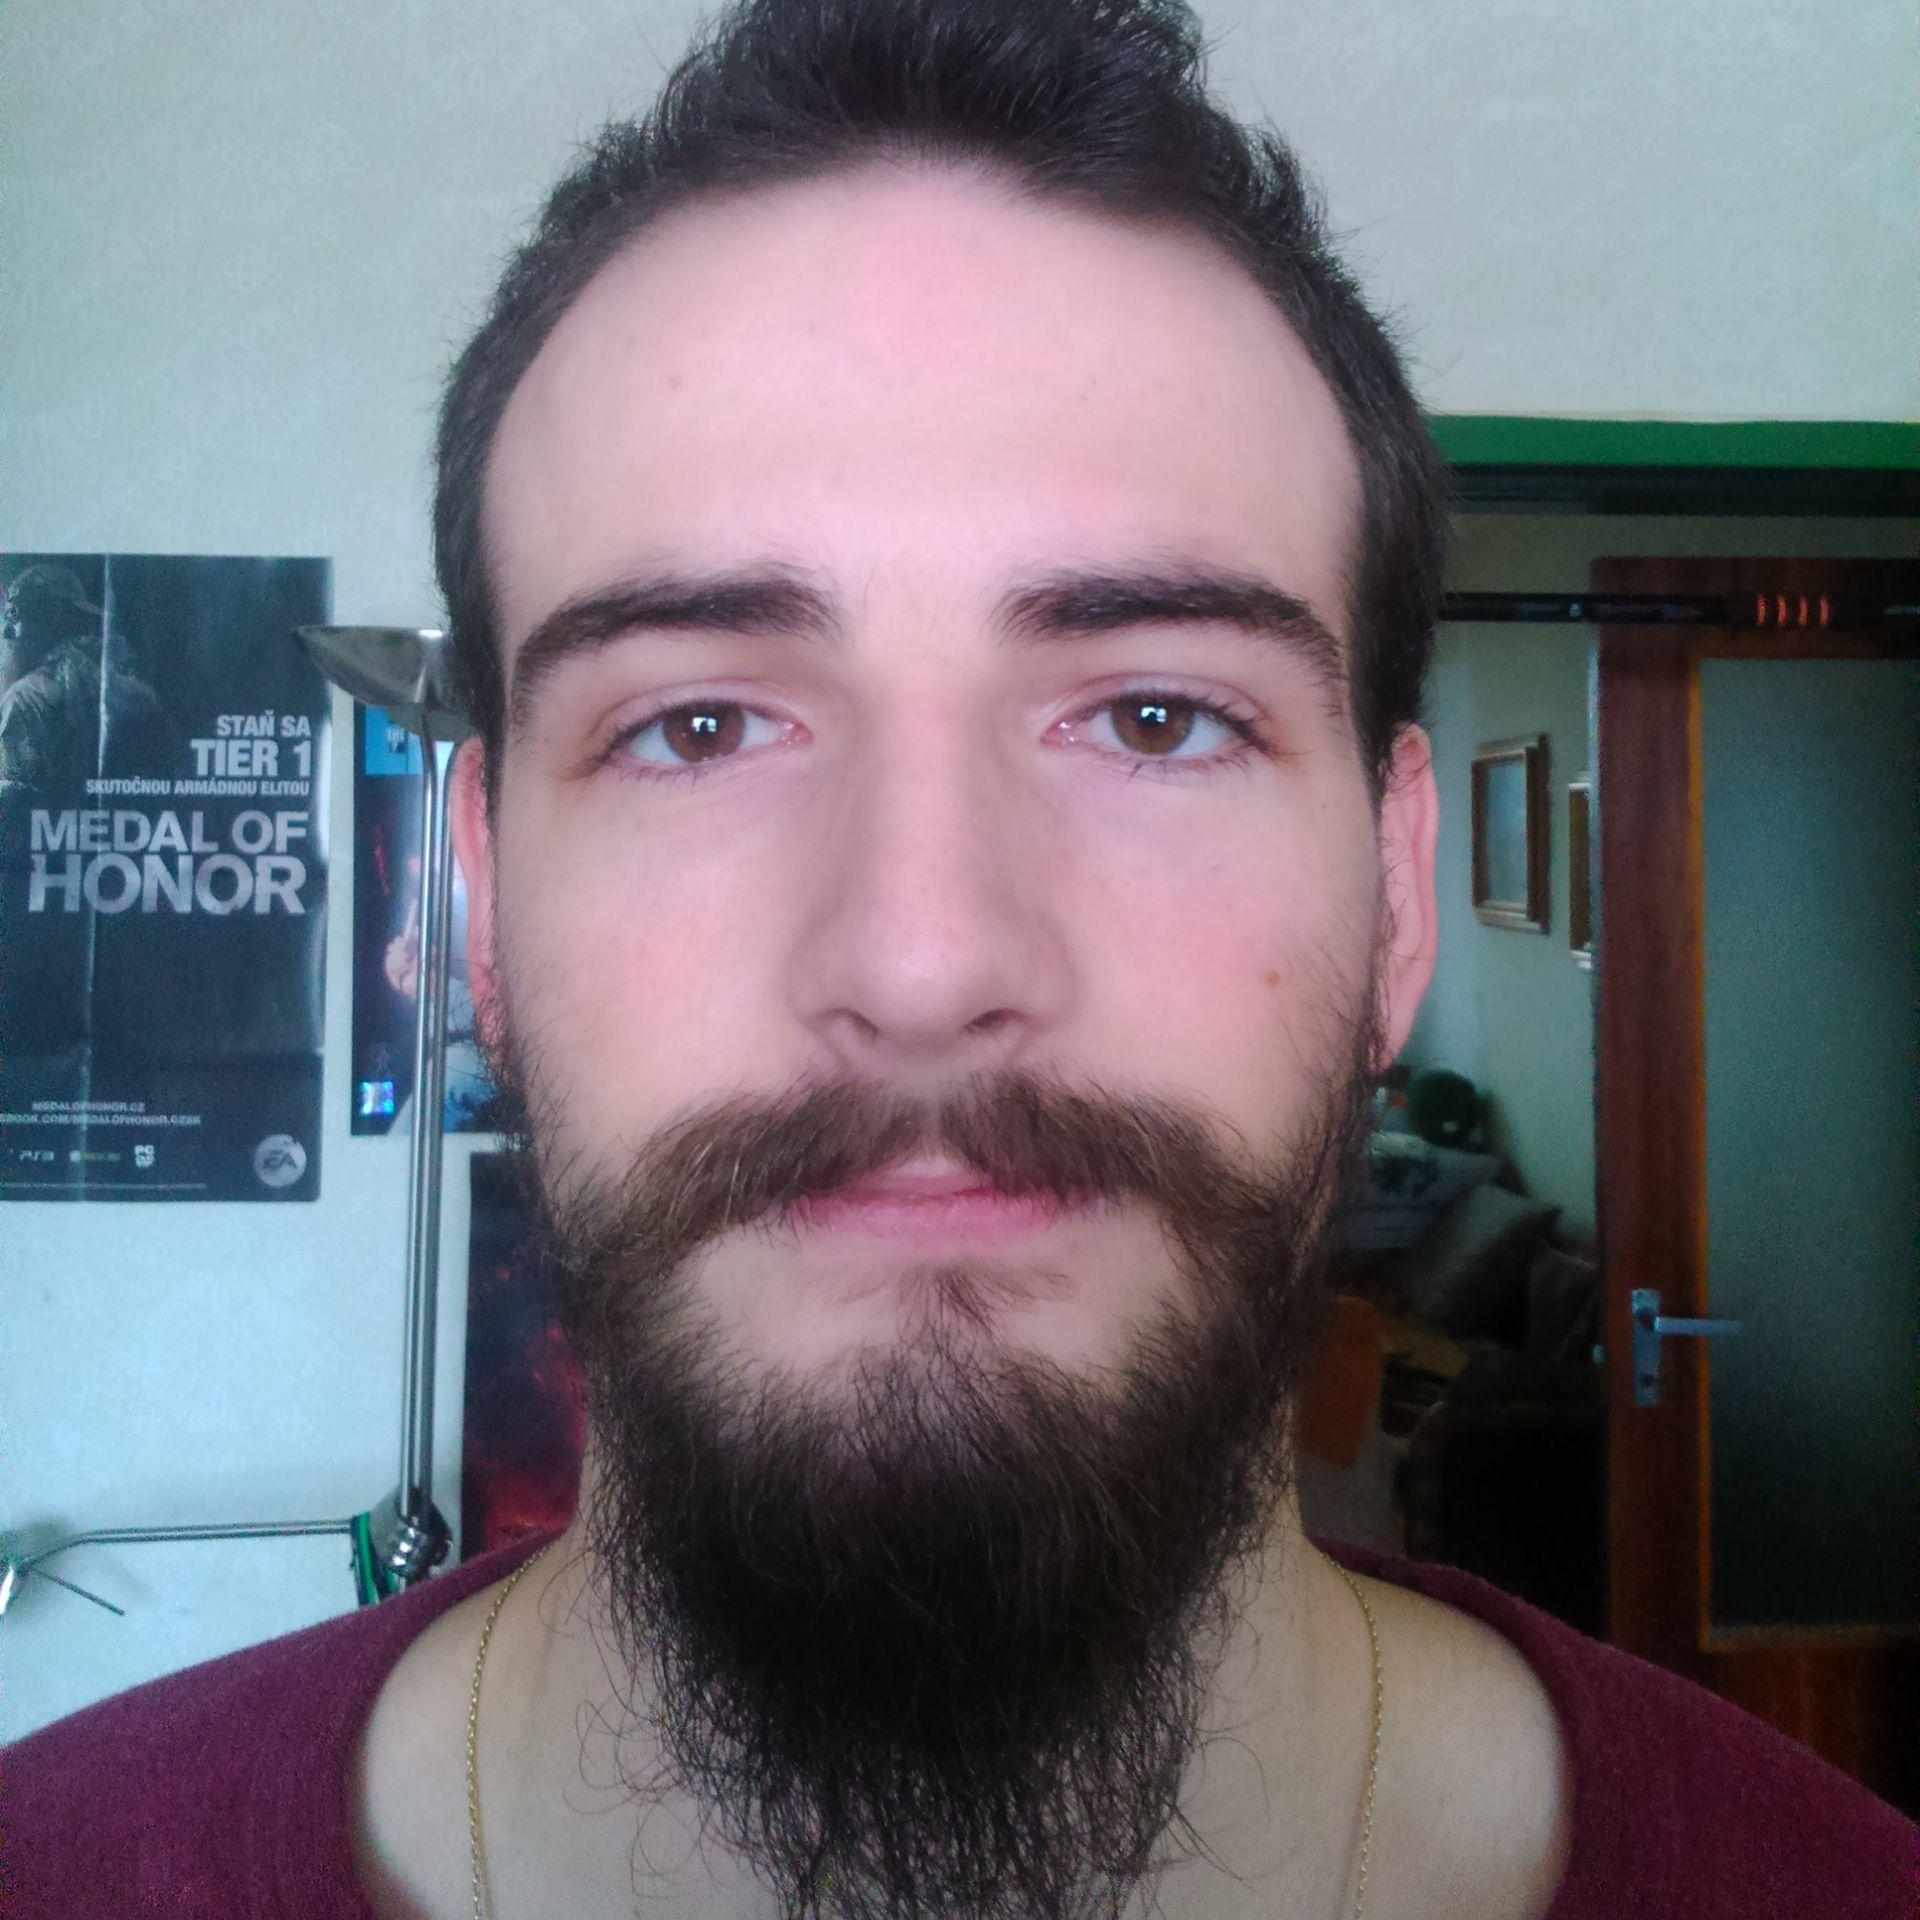 fotografia p001 profilu 0102IUDZ52